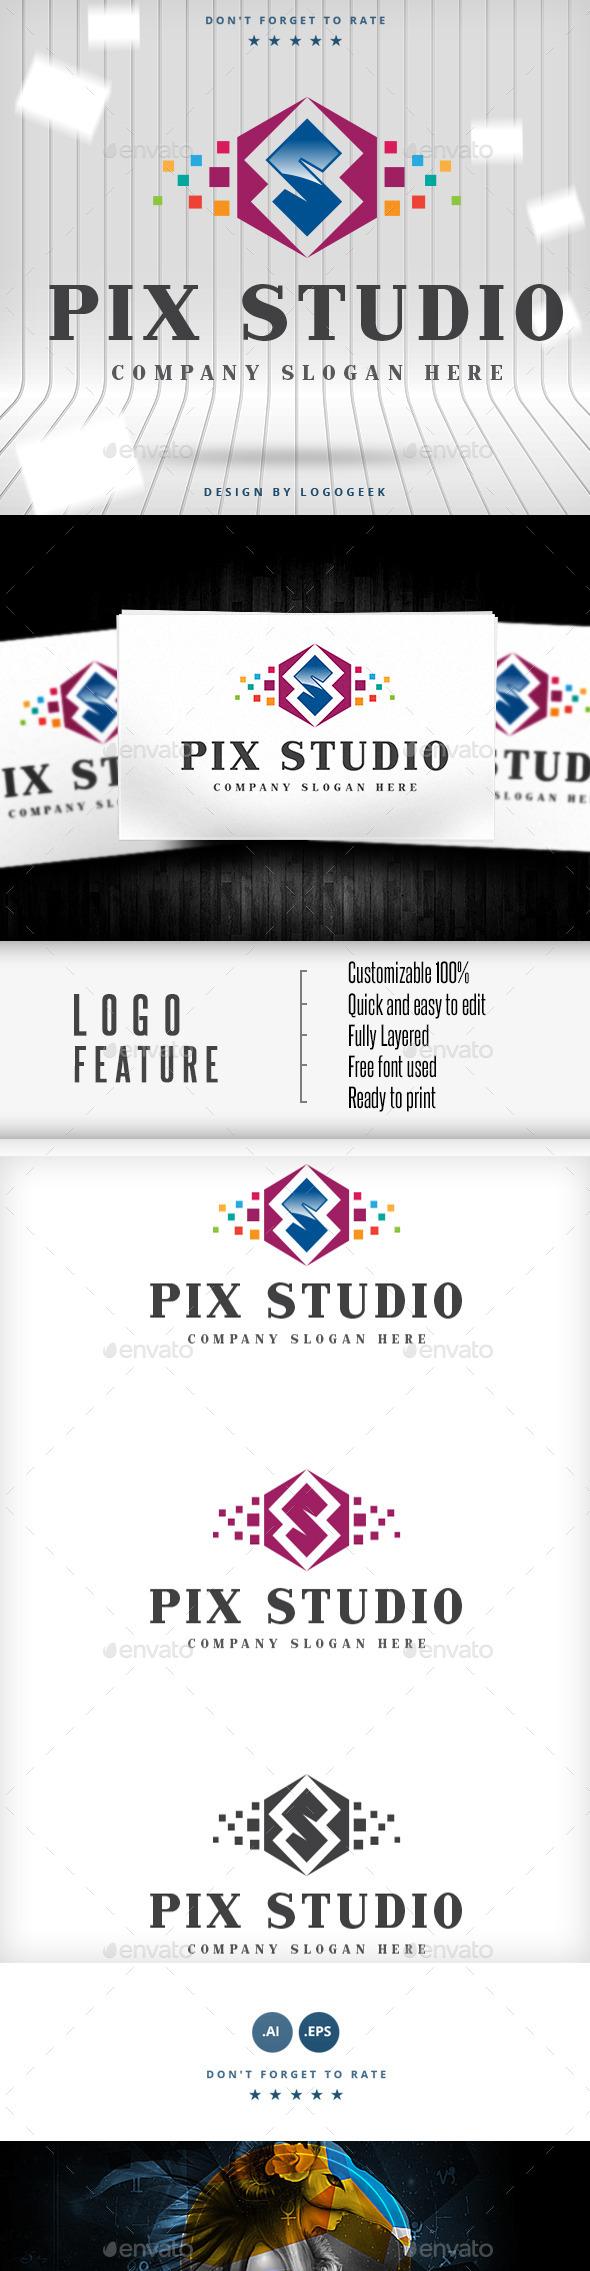 Pix Studio Logo - Logo Templates